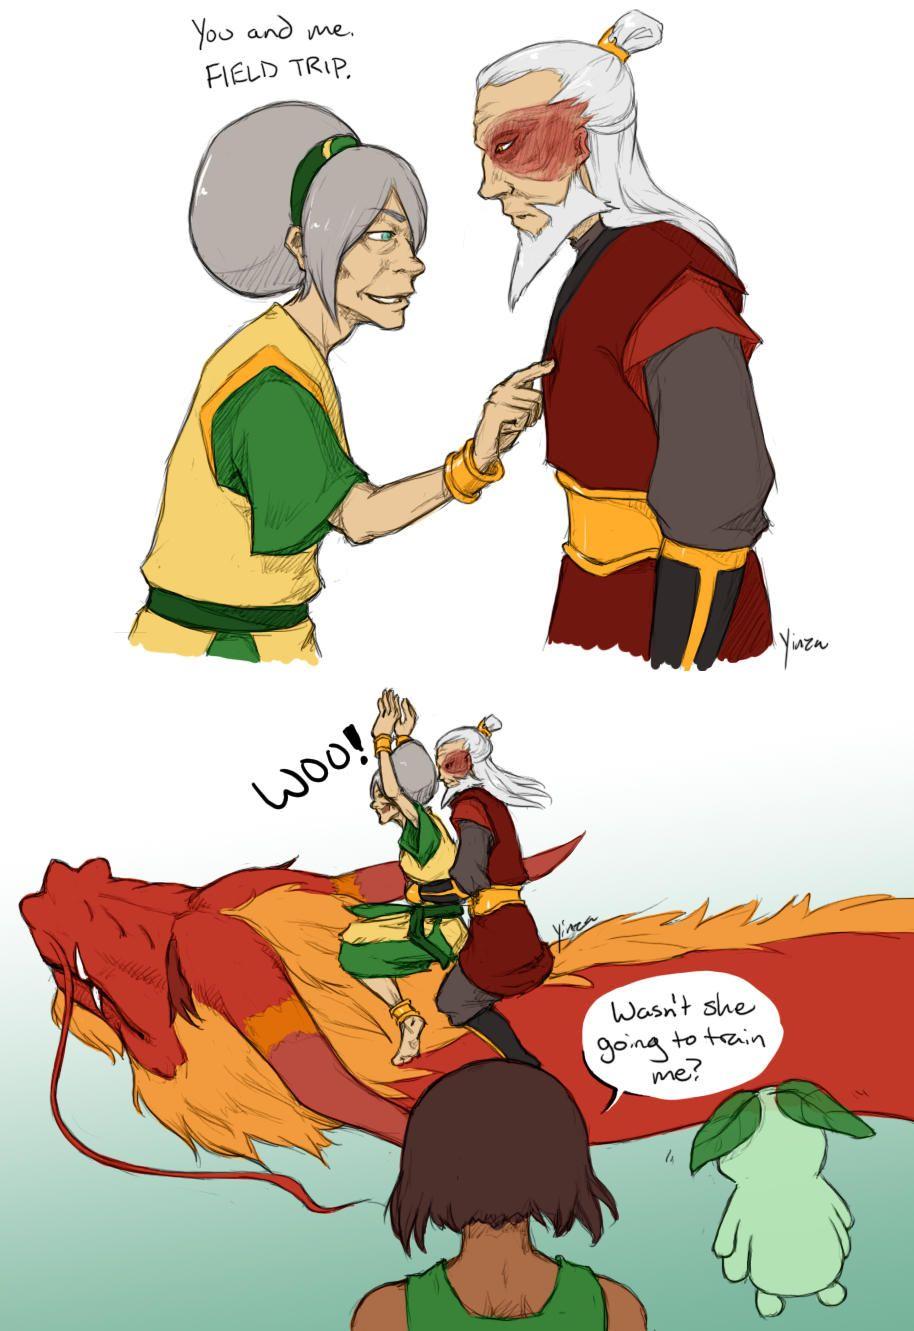 [Image - 850931]   Avatar: The Last Airbender / The Legend of Korra